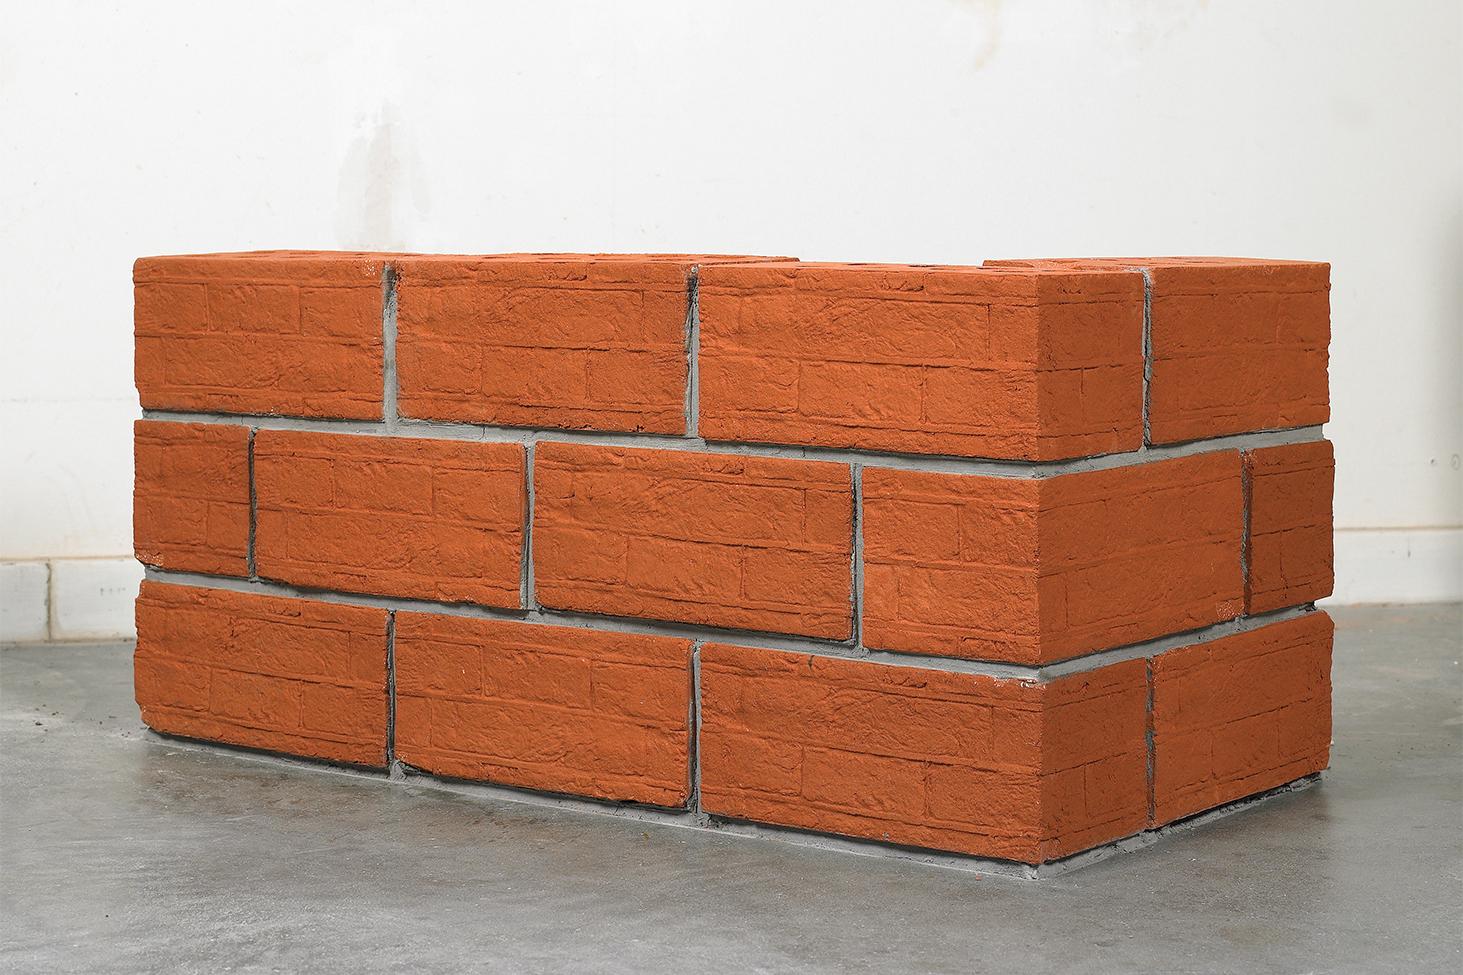 Brick-EKWC_06